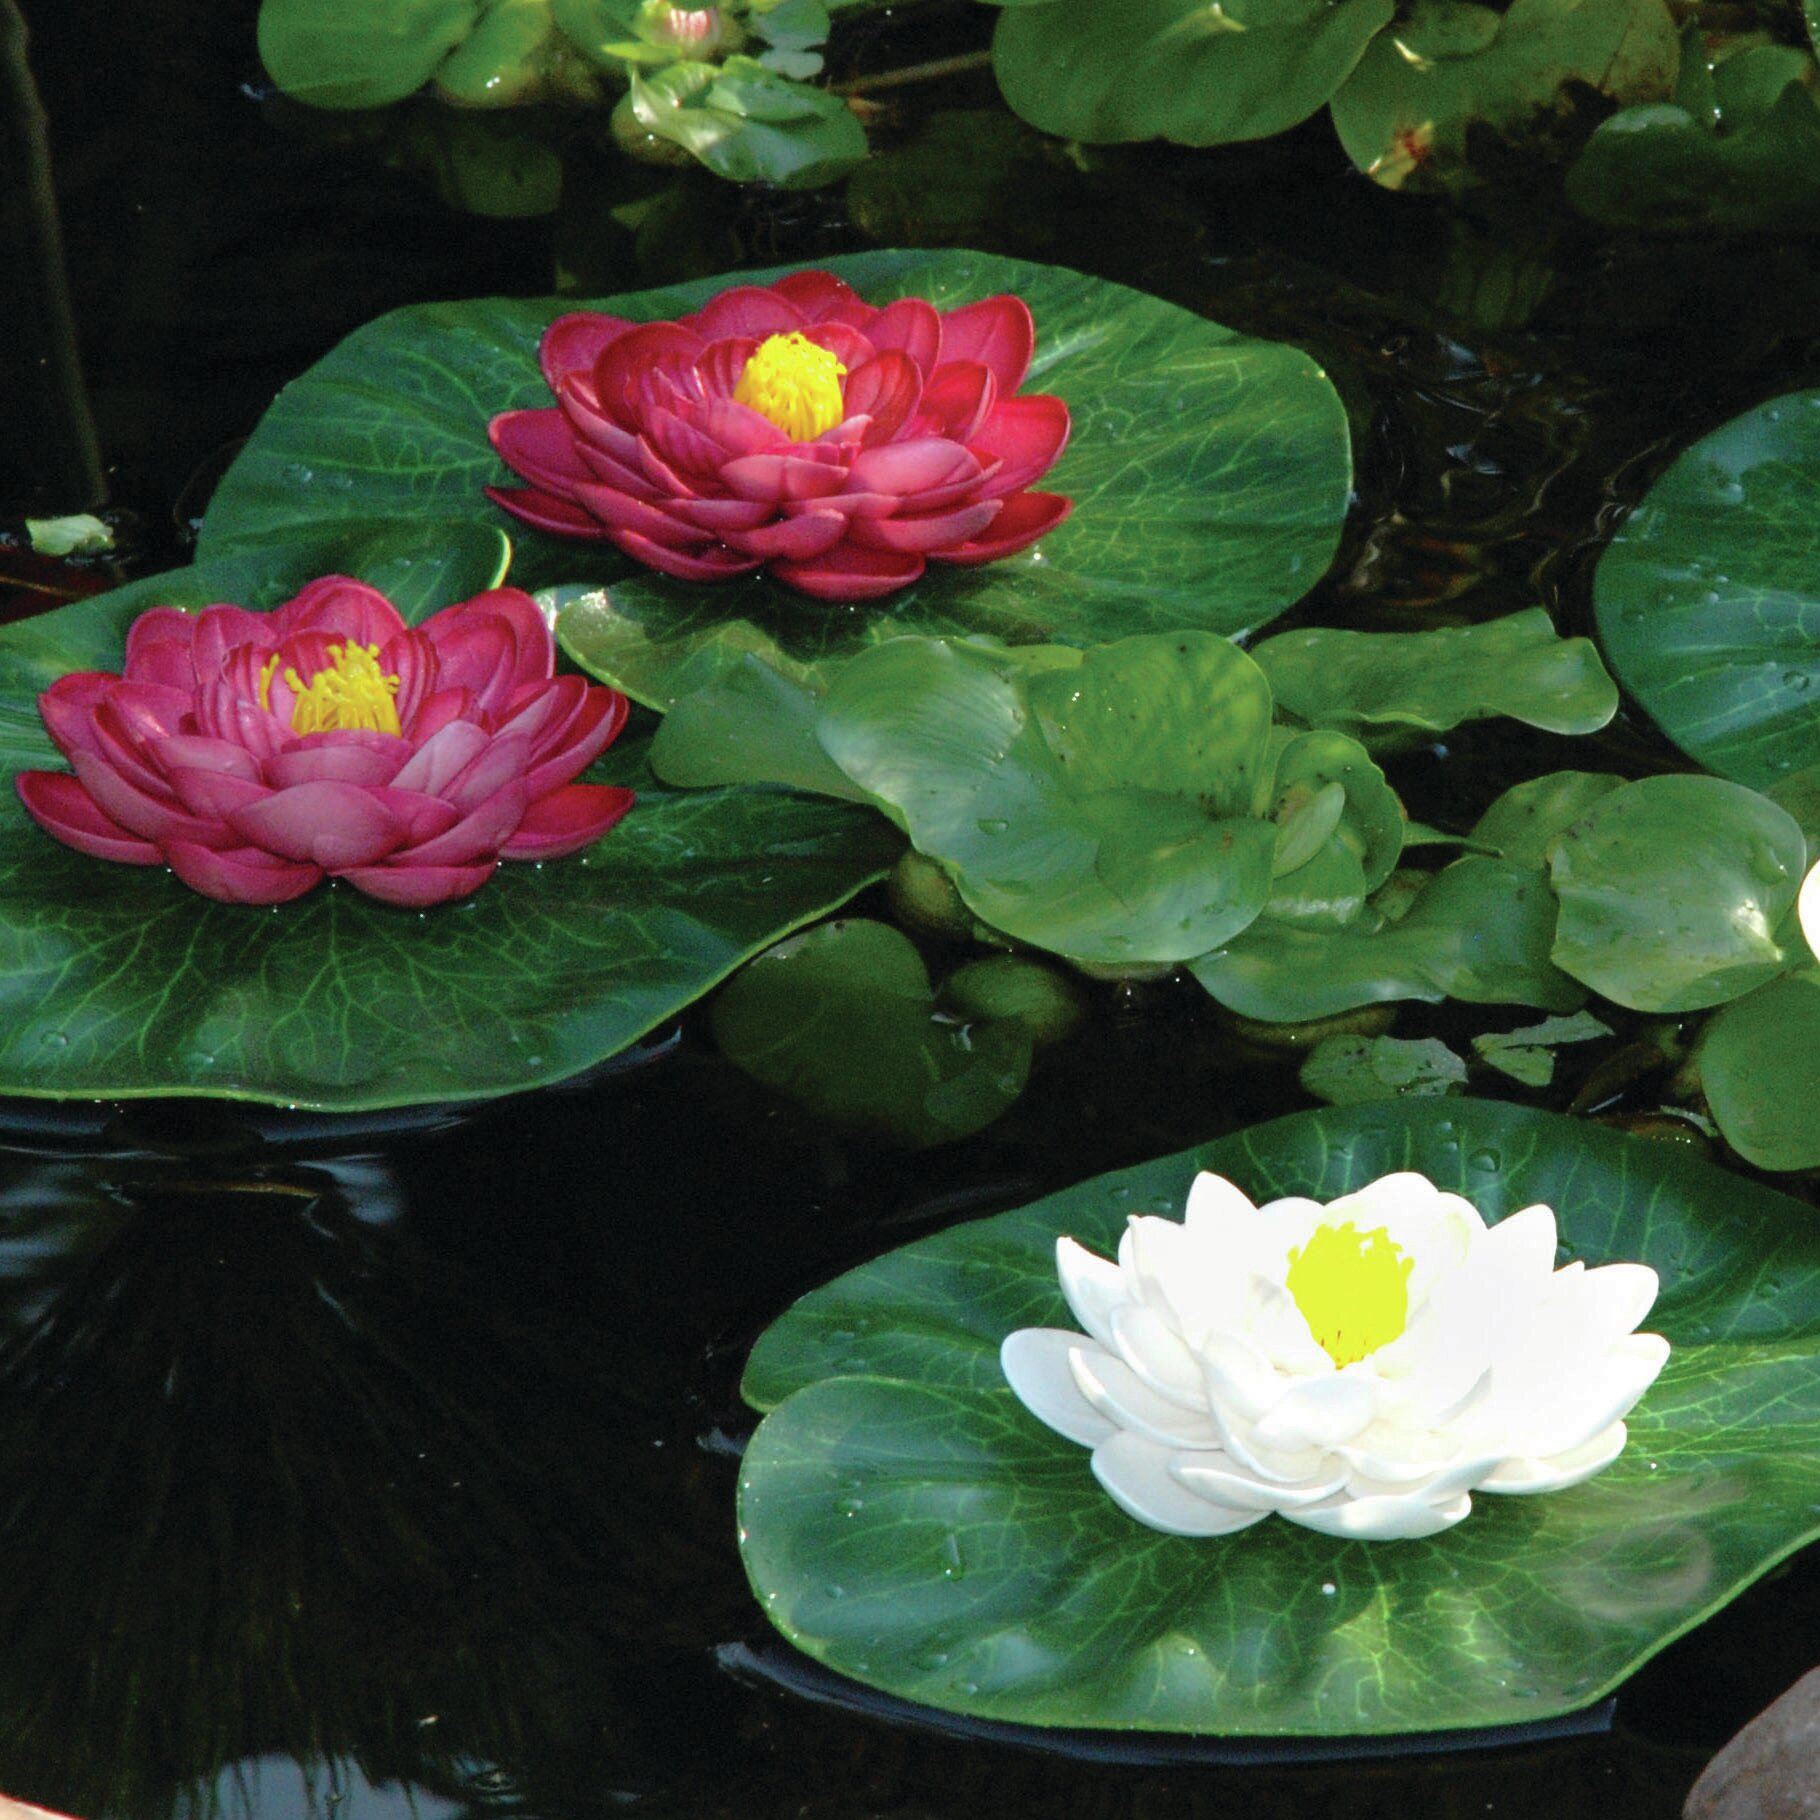 Pond boss 3 piece floating lily pad set reviews wayfair izmirmasajfo